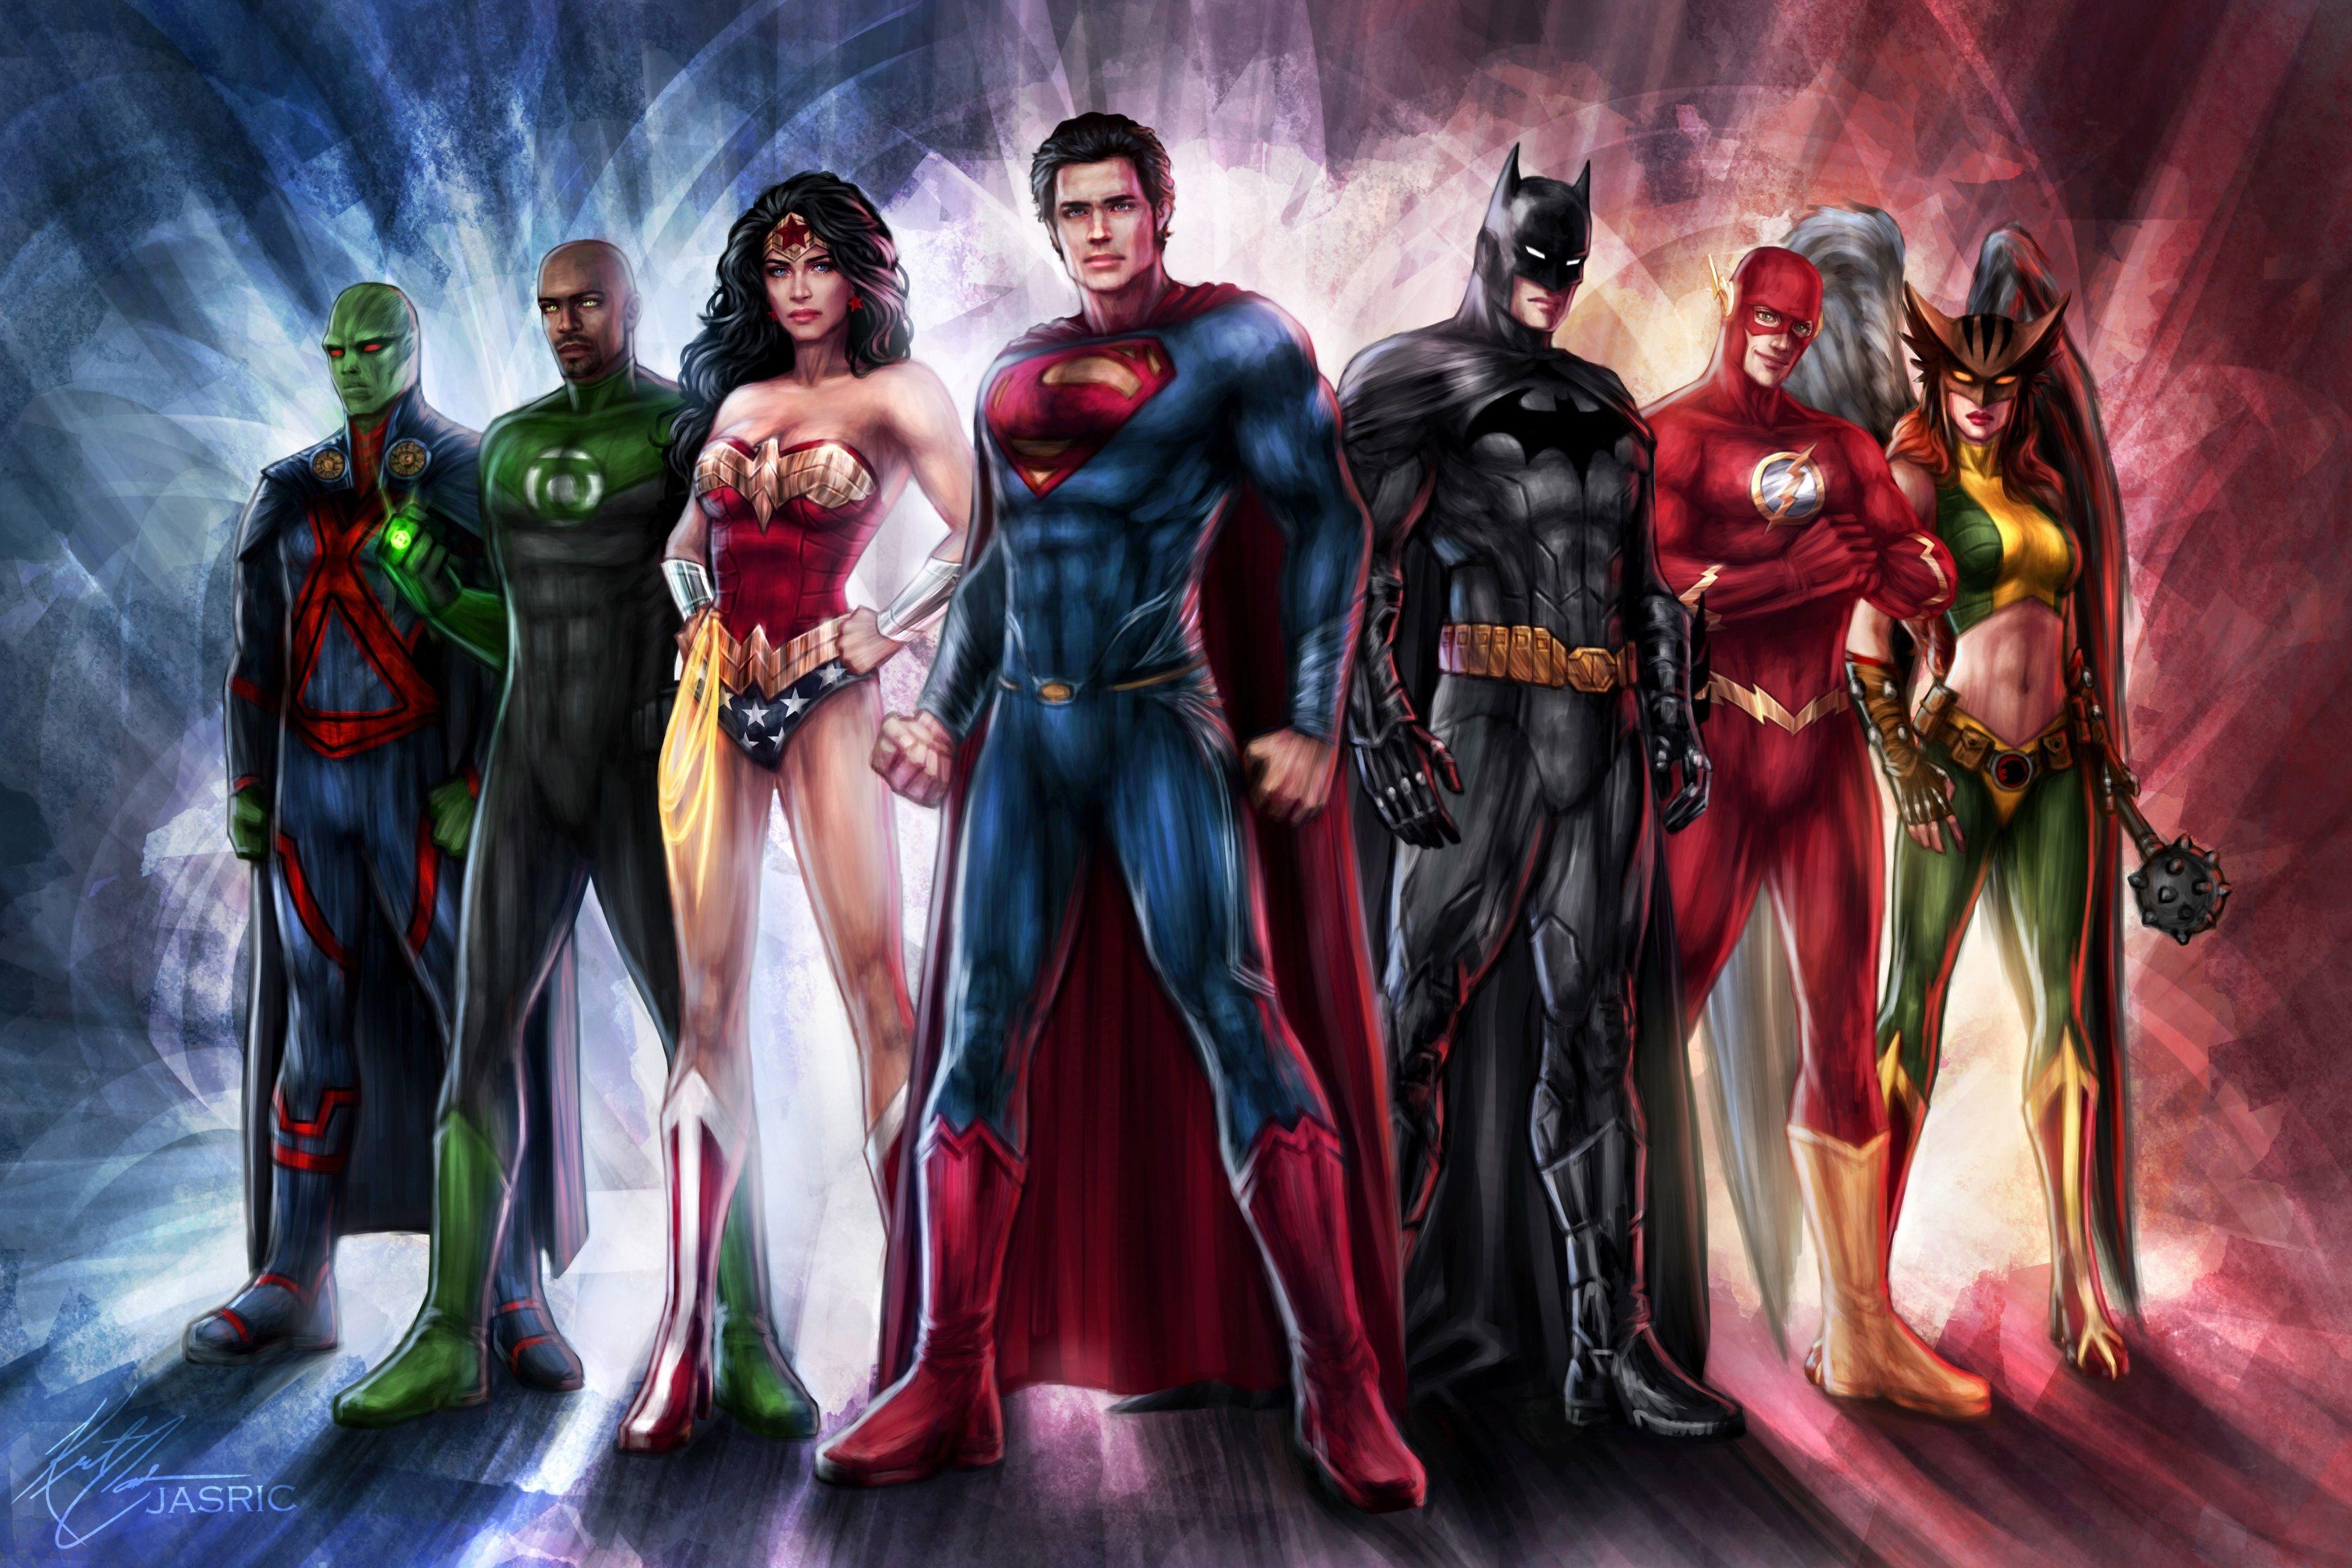 3840x2560 Justice League 4k Best Hd Wallpaper For Pc Free Download Justice League Art Dc Comics Wallpaper Justice League